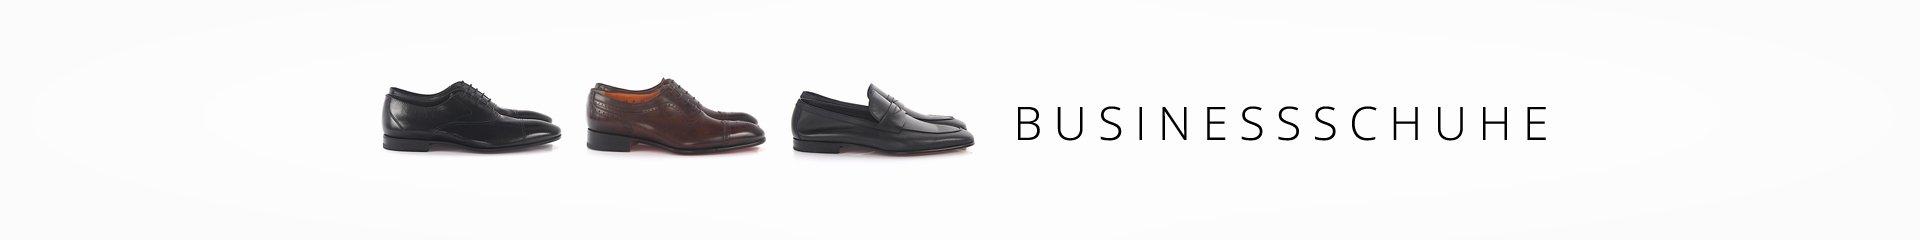 Herren Business-Schuhe